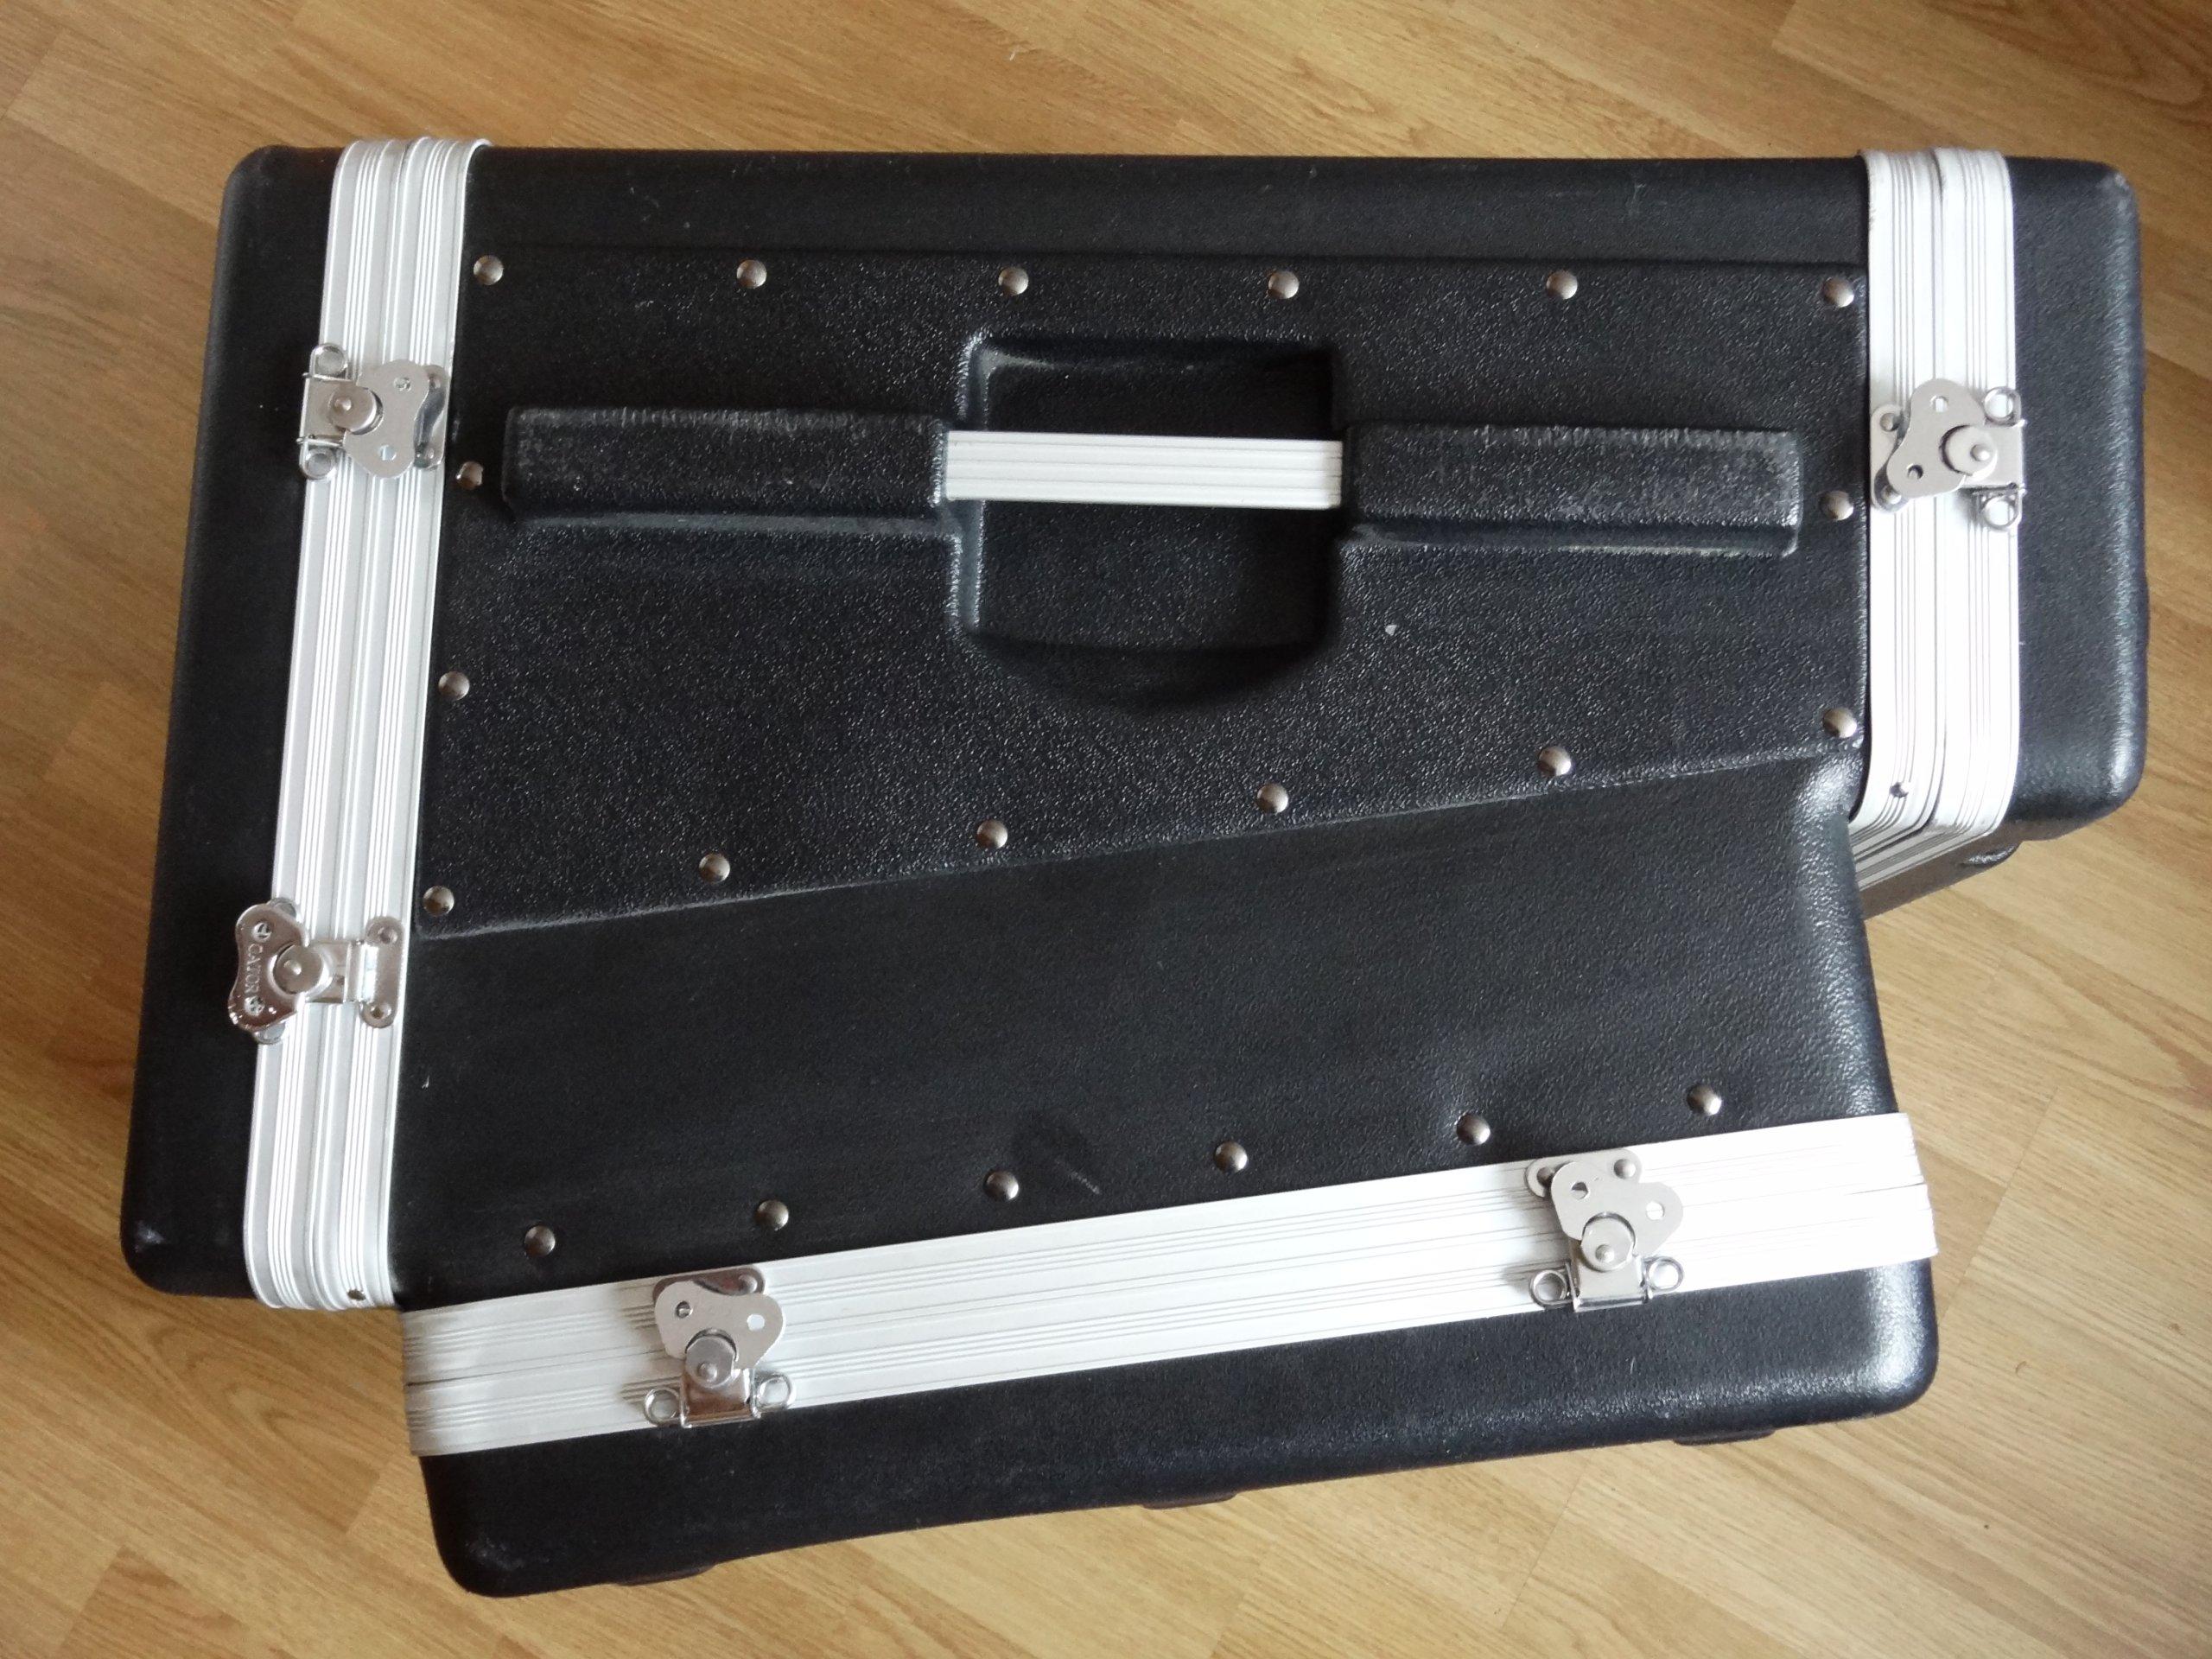 GATOR RACK CASE GRC-10X4 3D 4U + 10U +